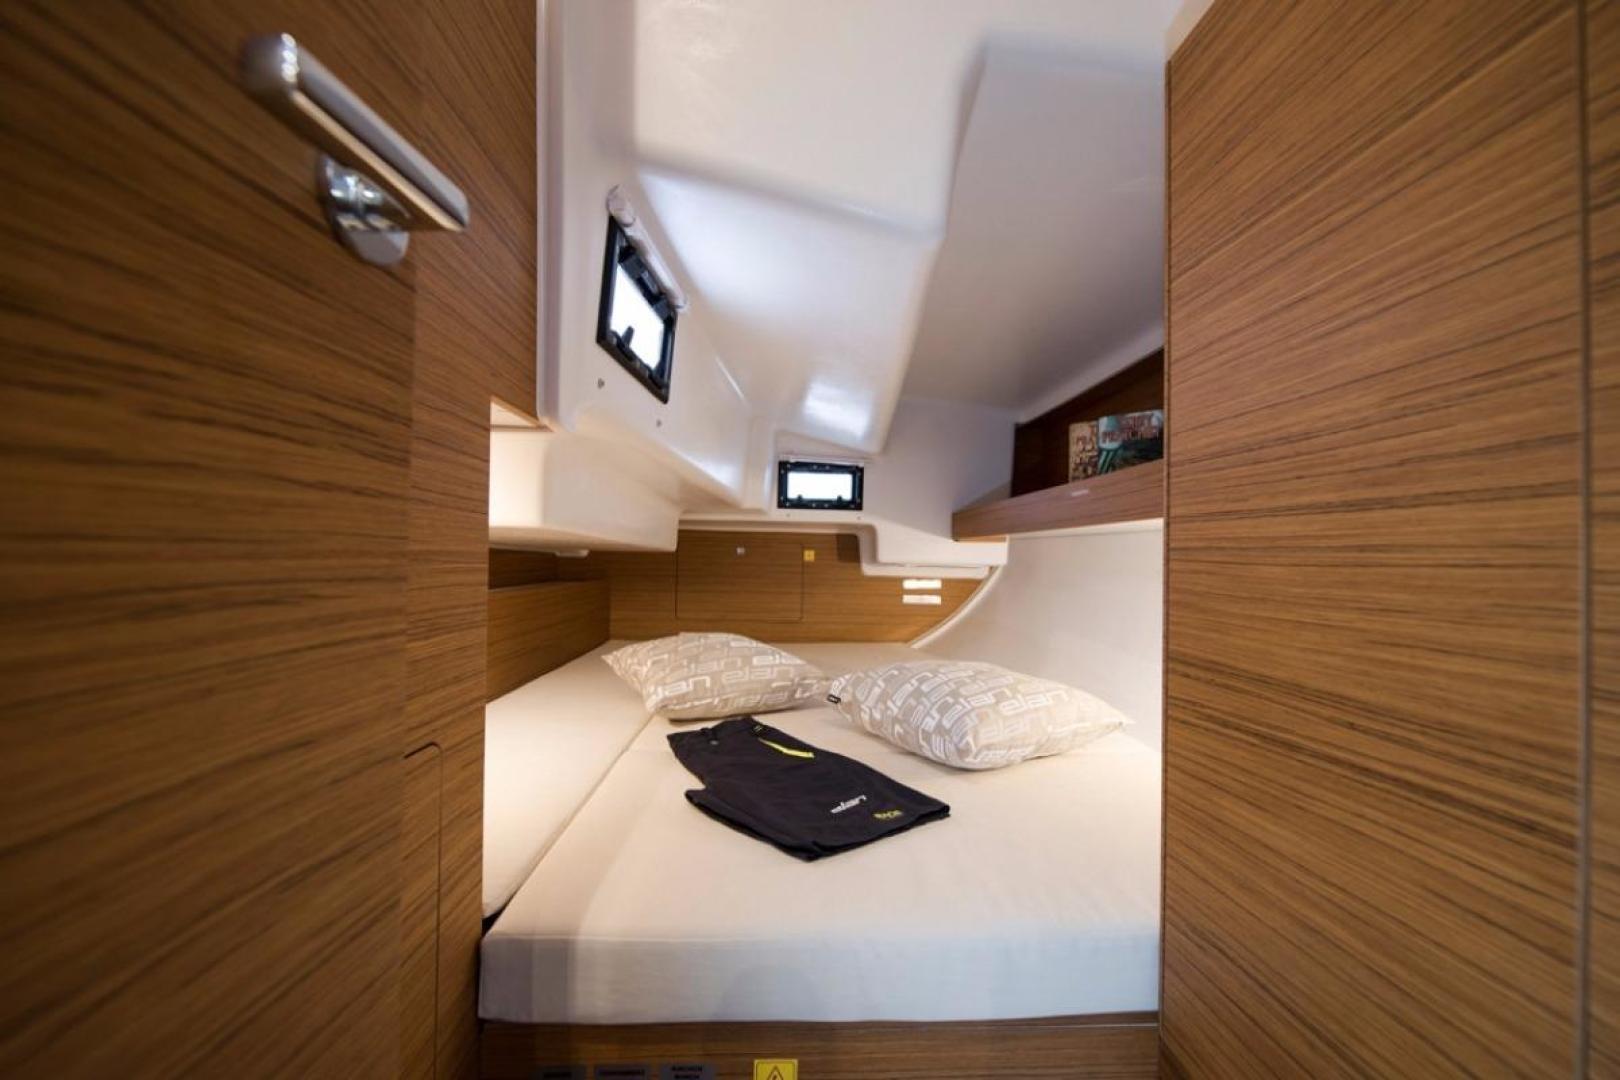 prestige hardwood flooring elmsford ny of 2017 elan e4 staten island yachts throughout launch gallery